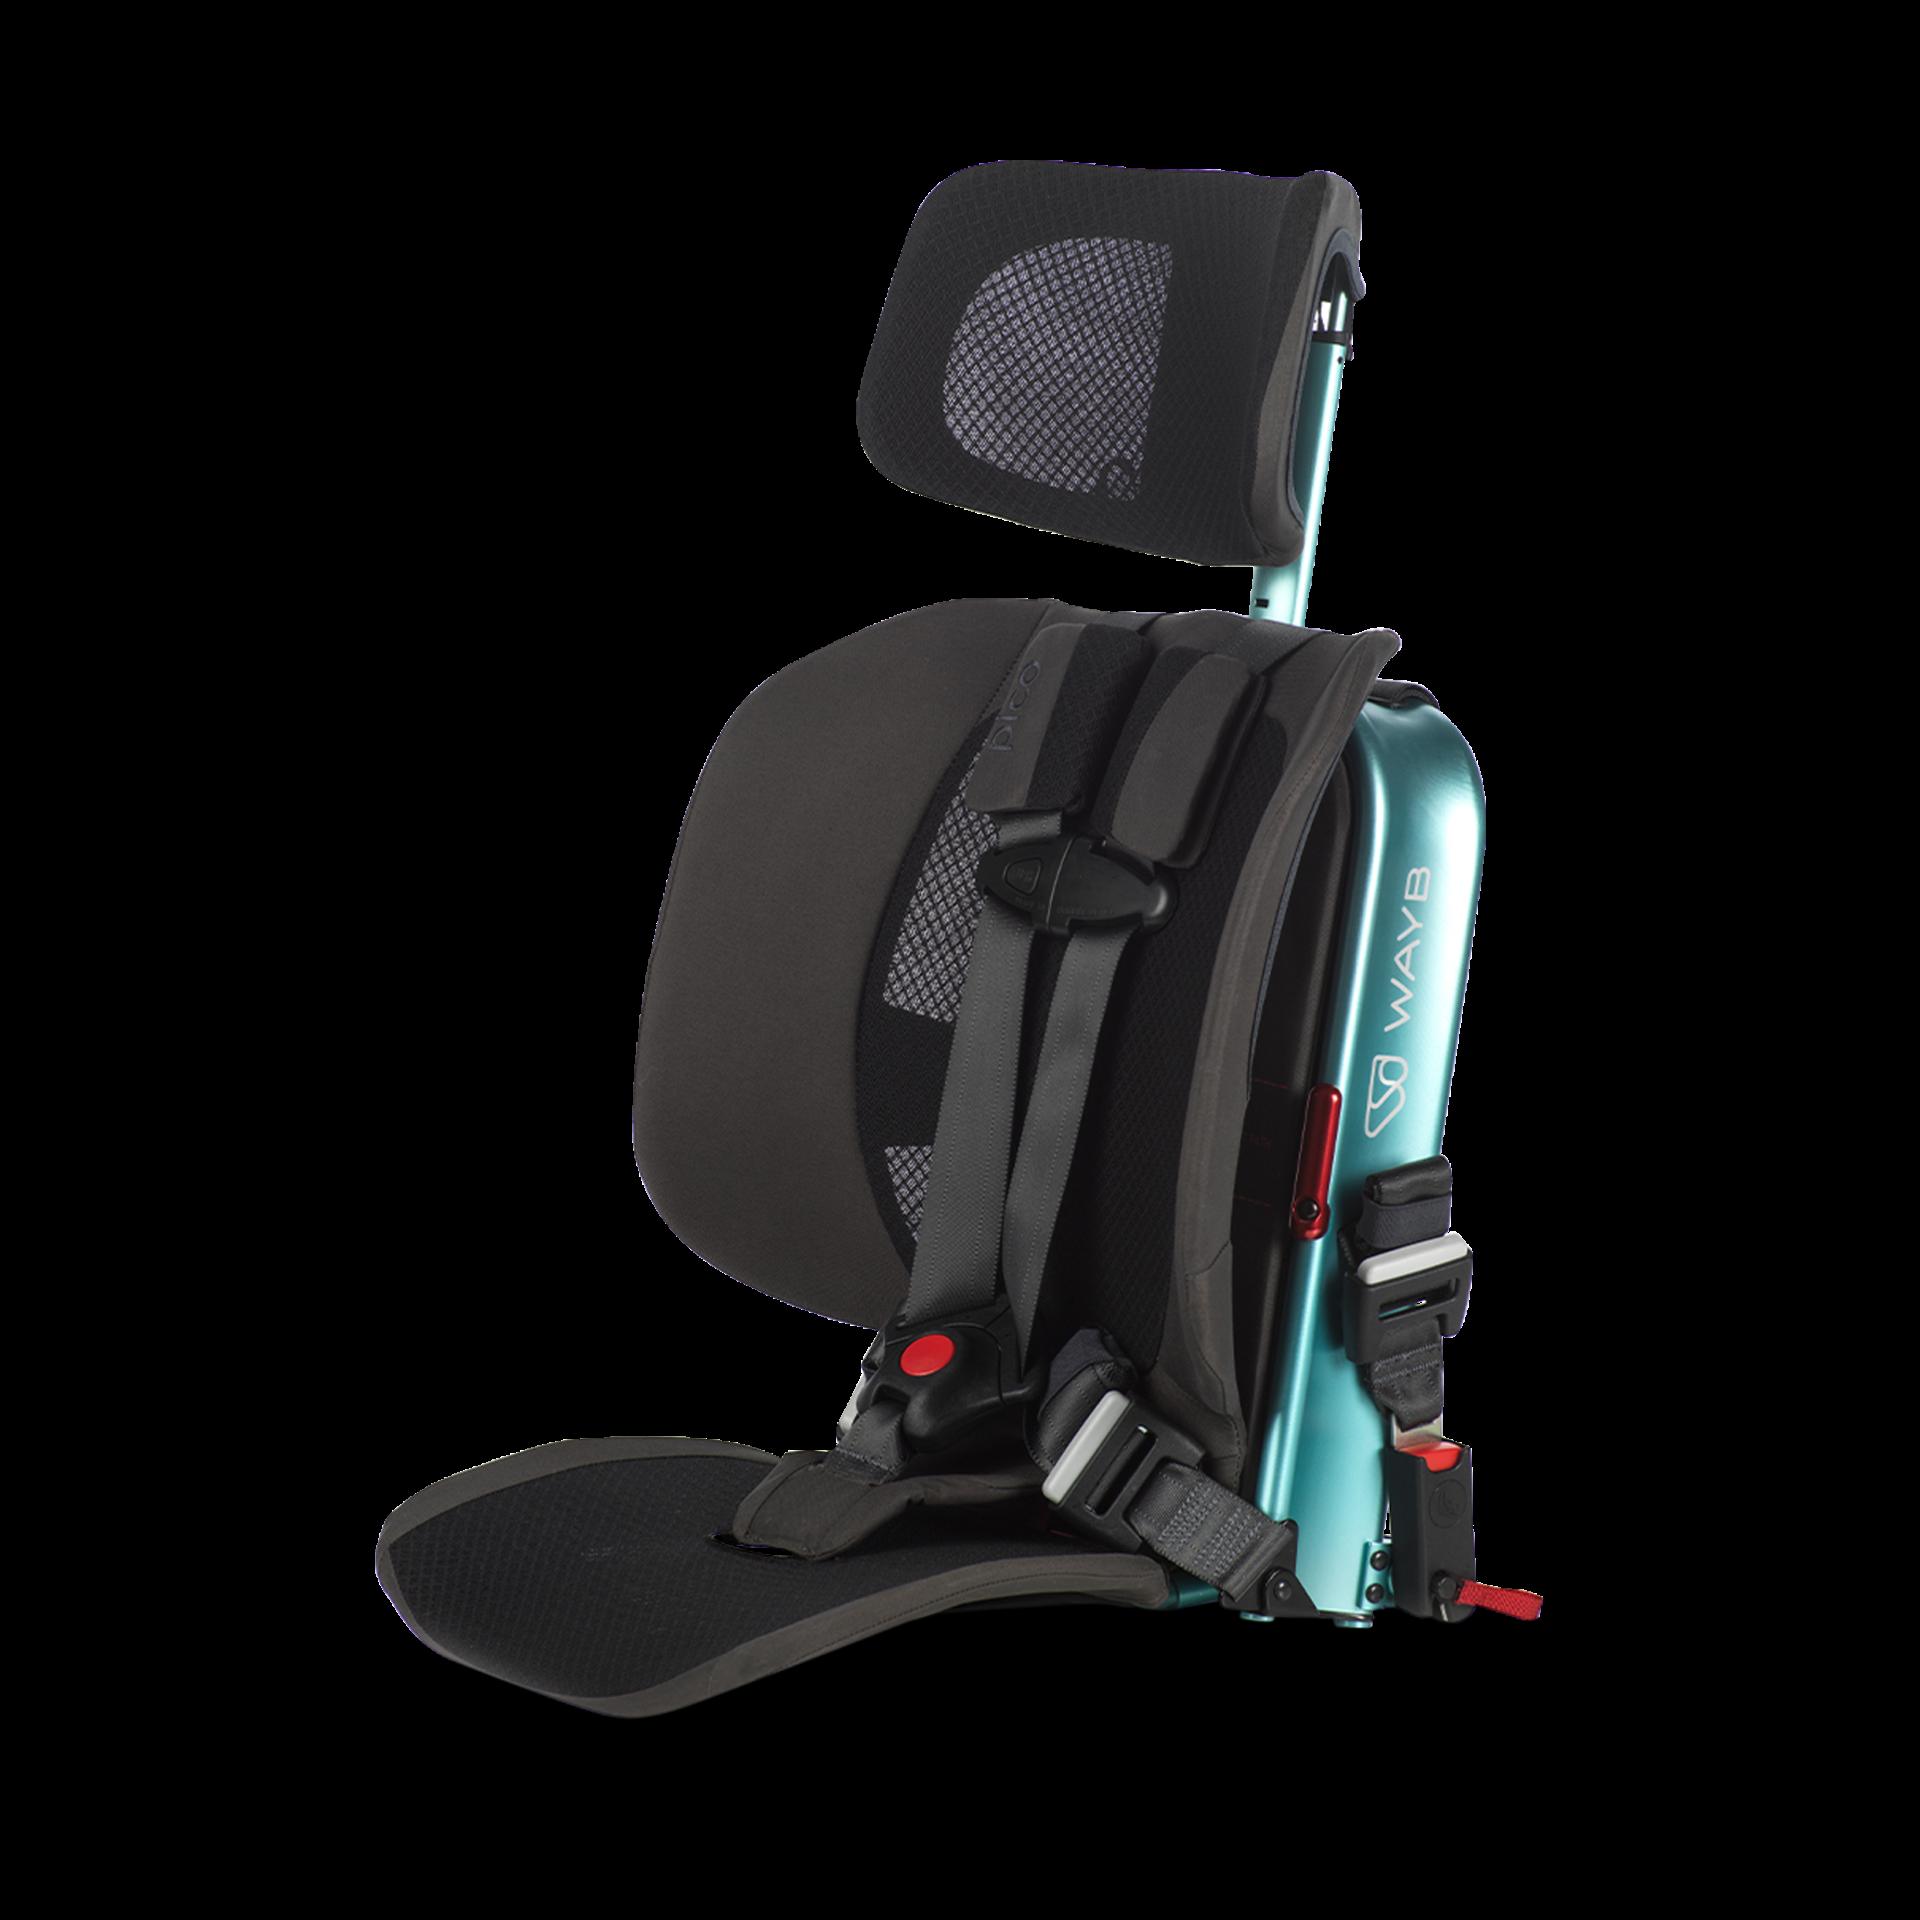 WAYB Pico Travel Car Seat - Babylist Store